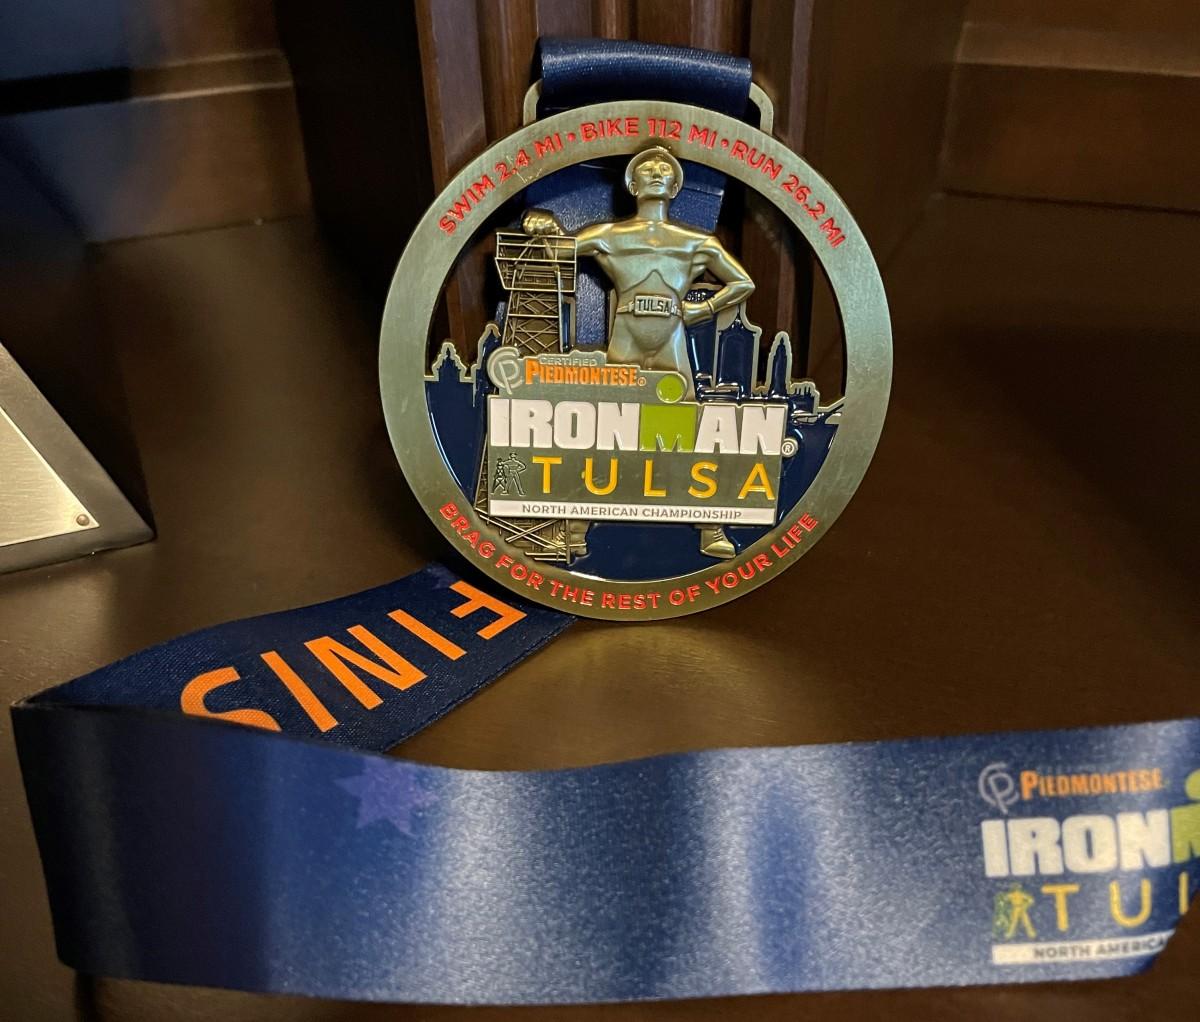 IRONMAN Tulsa 2021 RaceReport